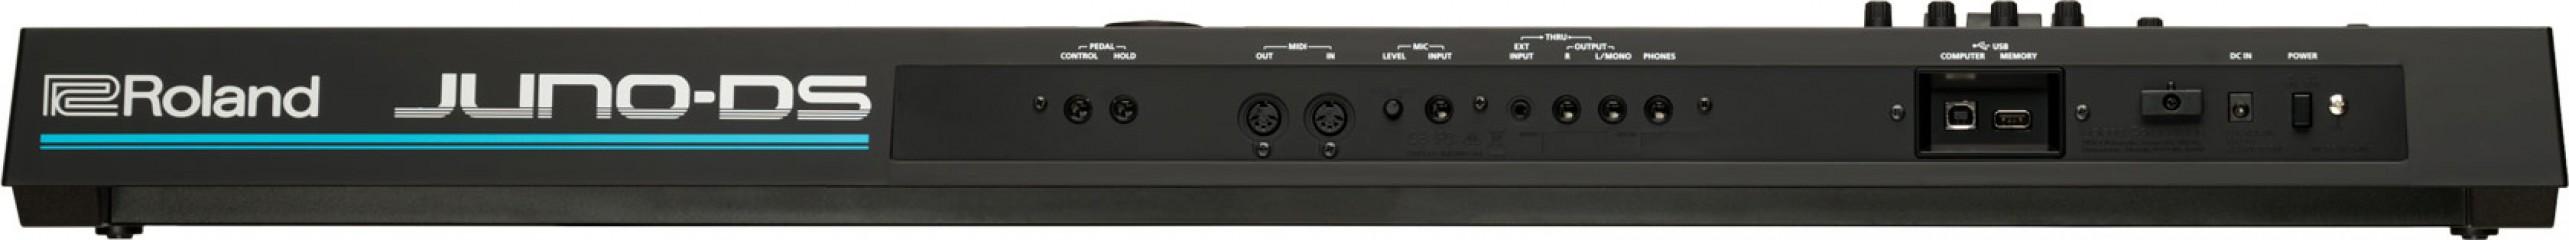 Синтезатор Roland JUNO-DS61